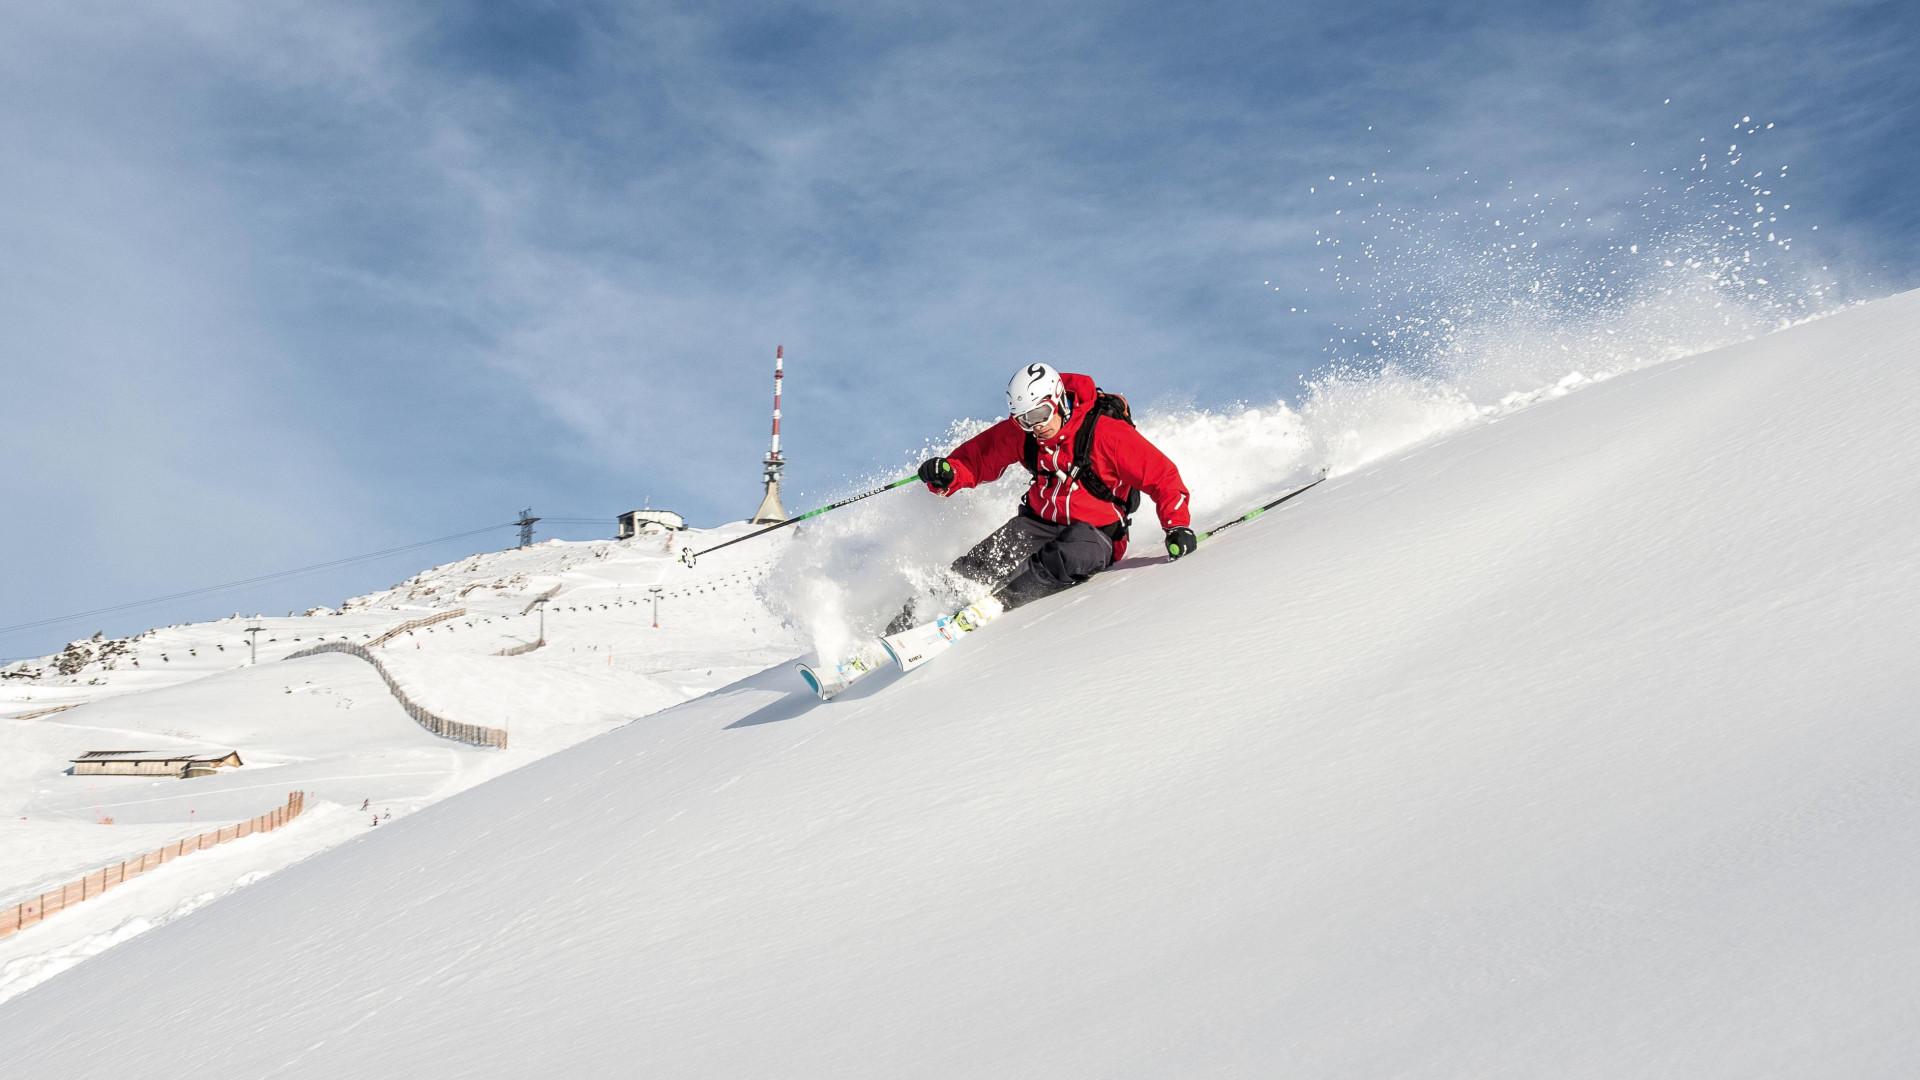 Skiier on the slopes at Kitzbühel